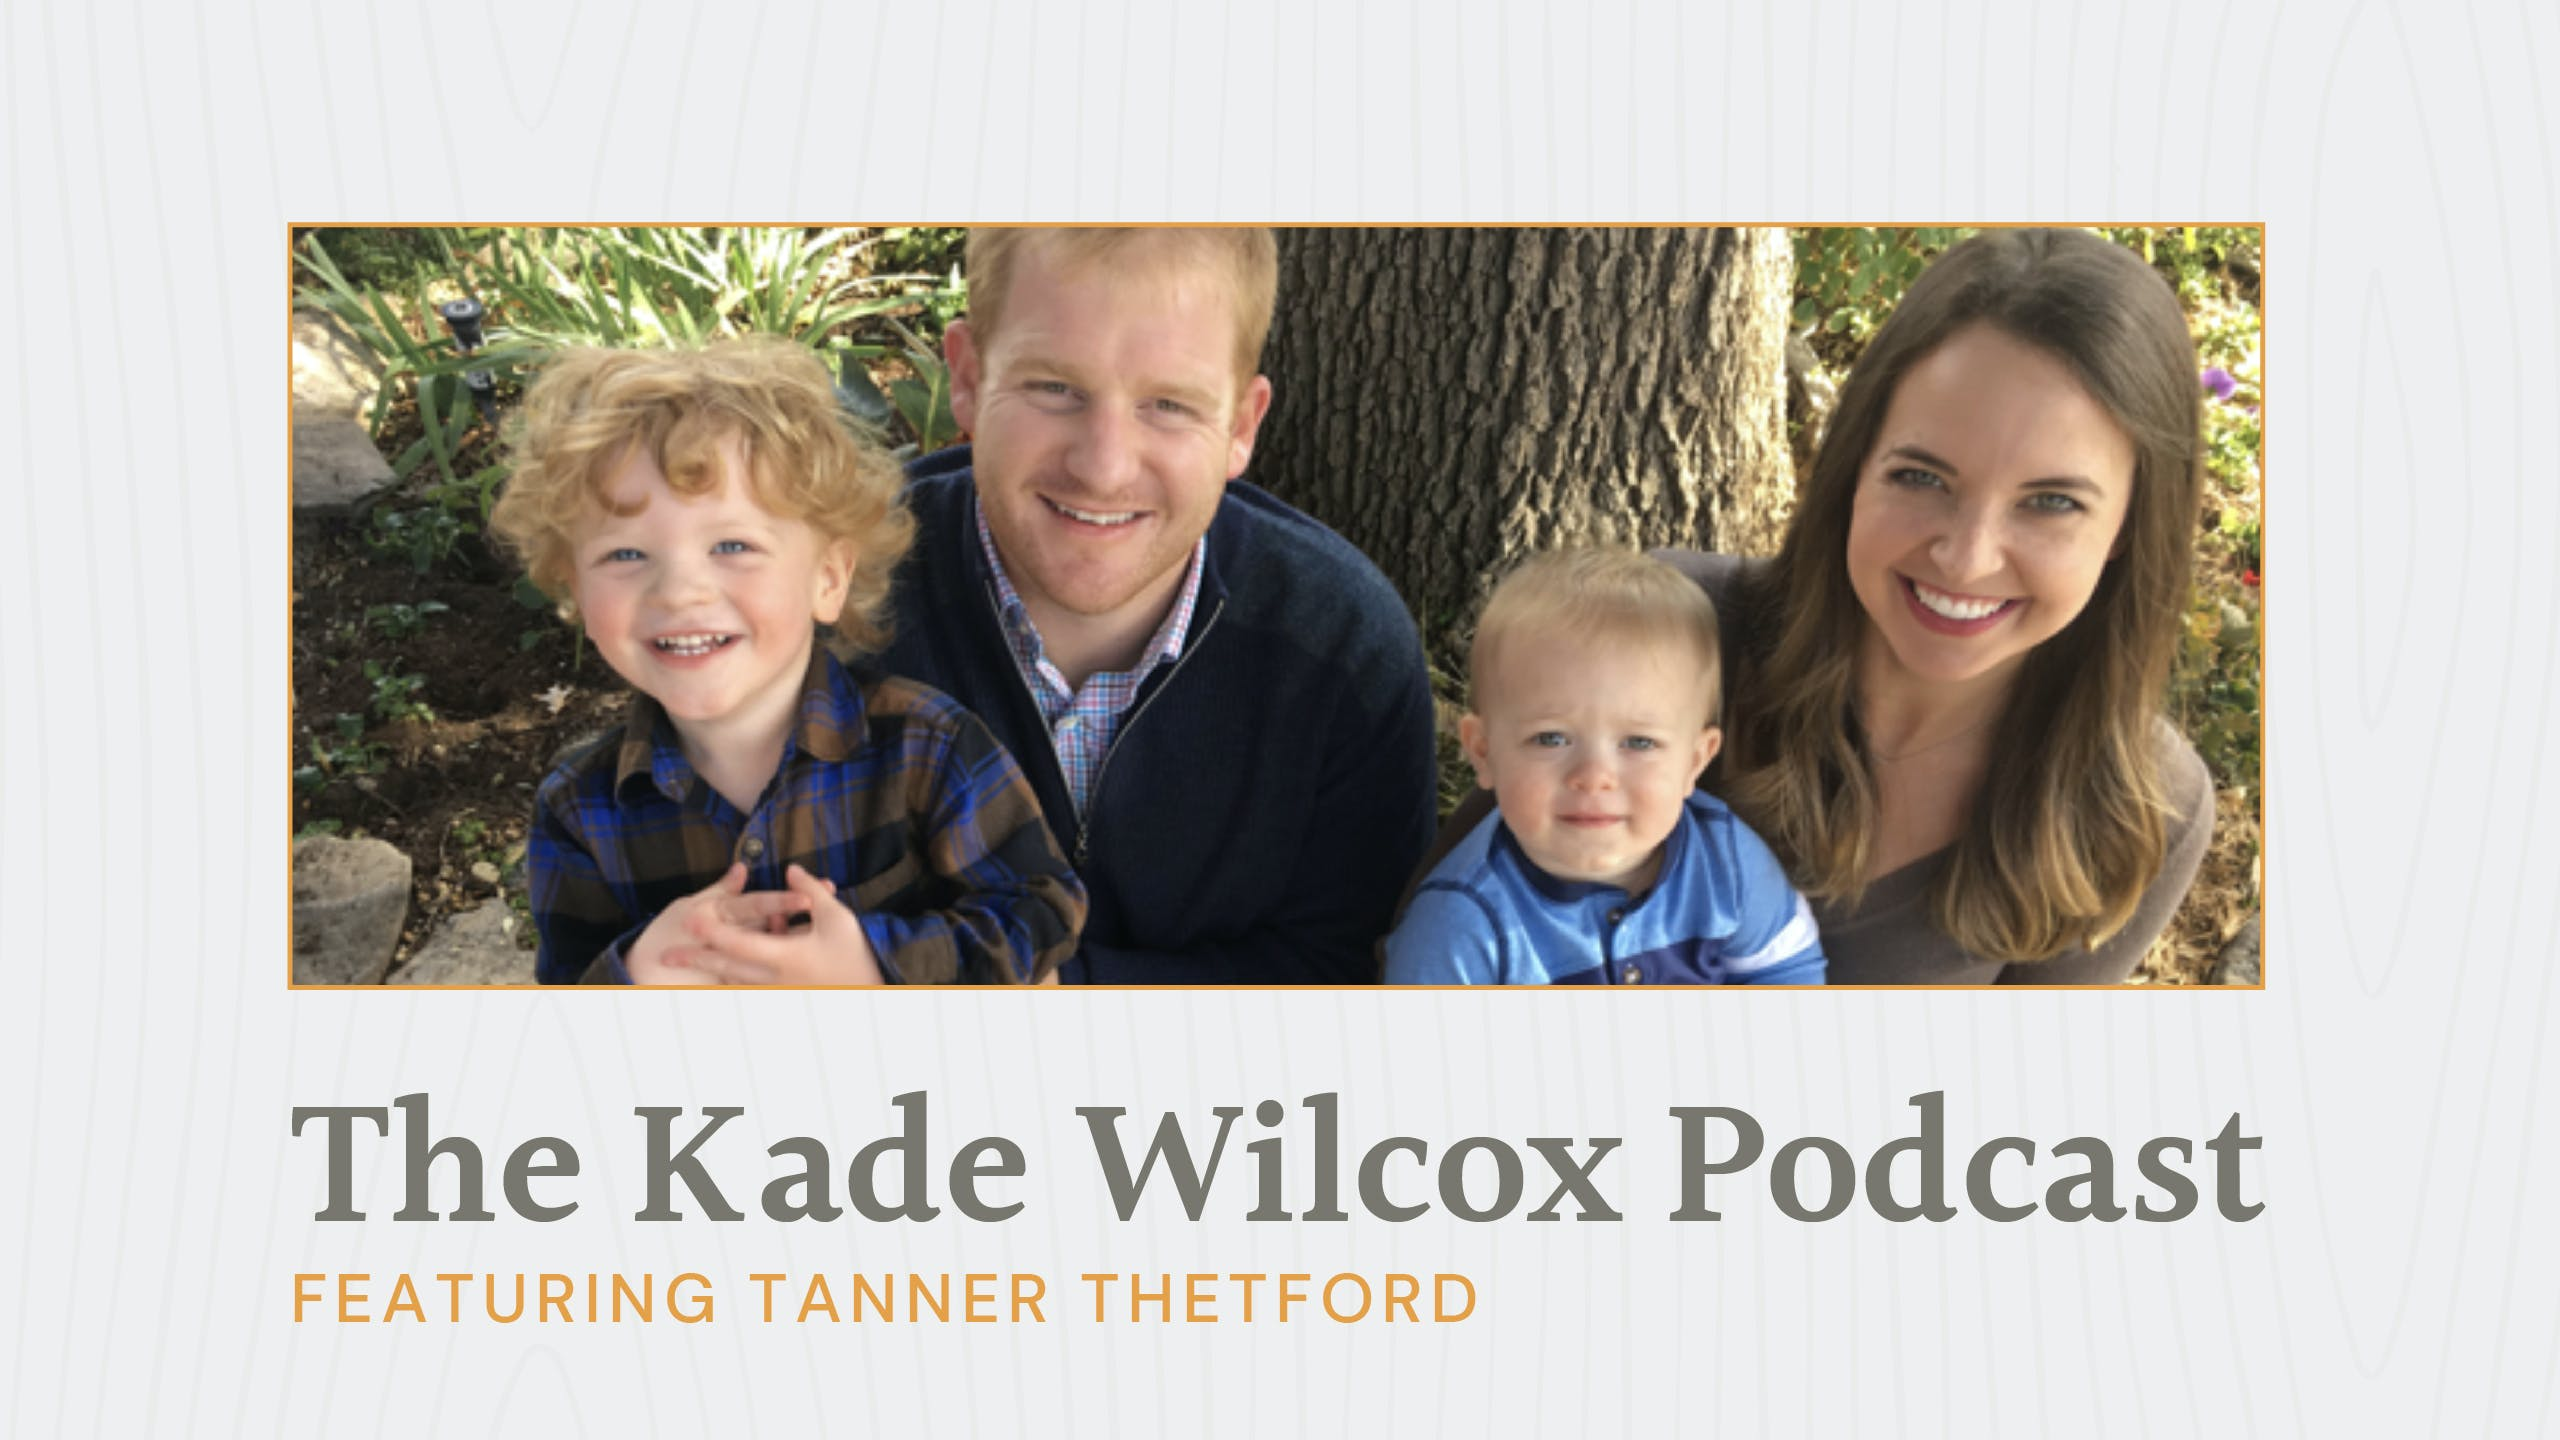 The Kade Wilcox Podcast: Tanner Thetford image